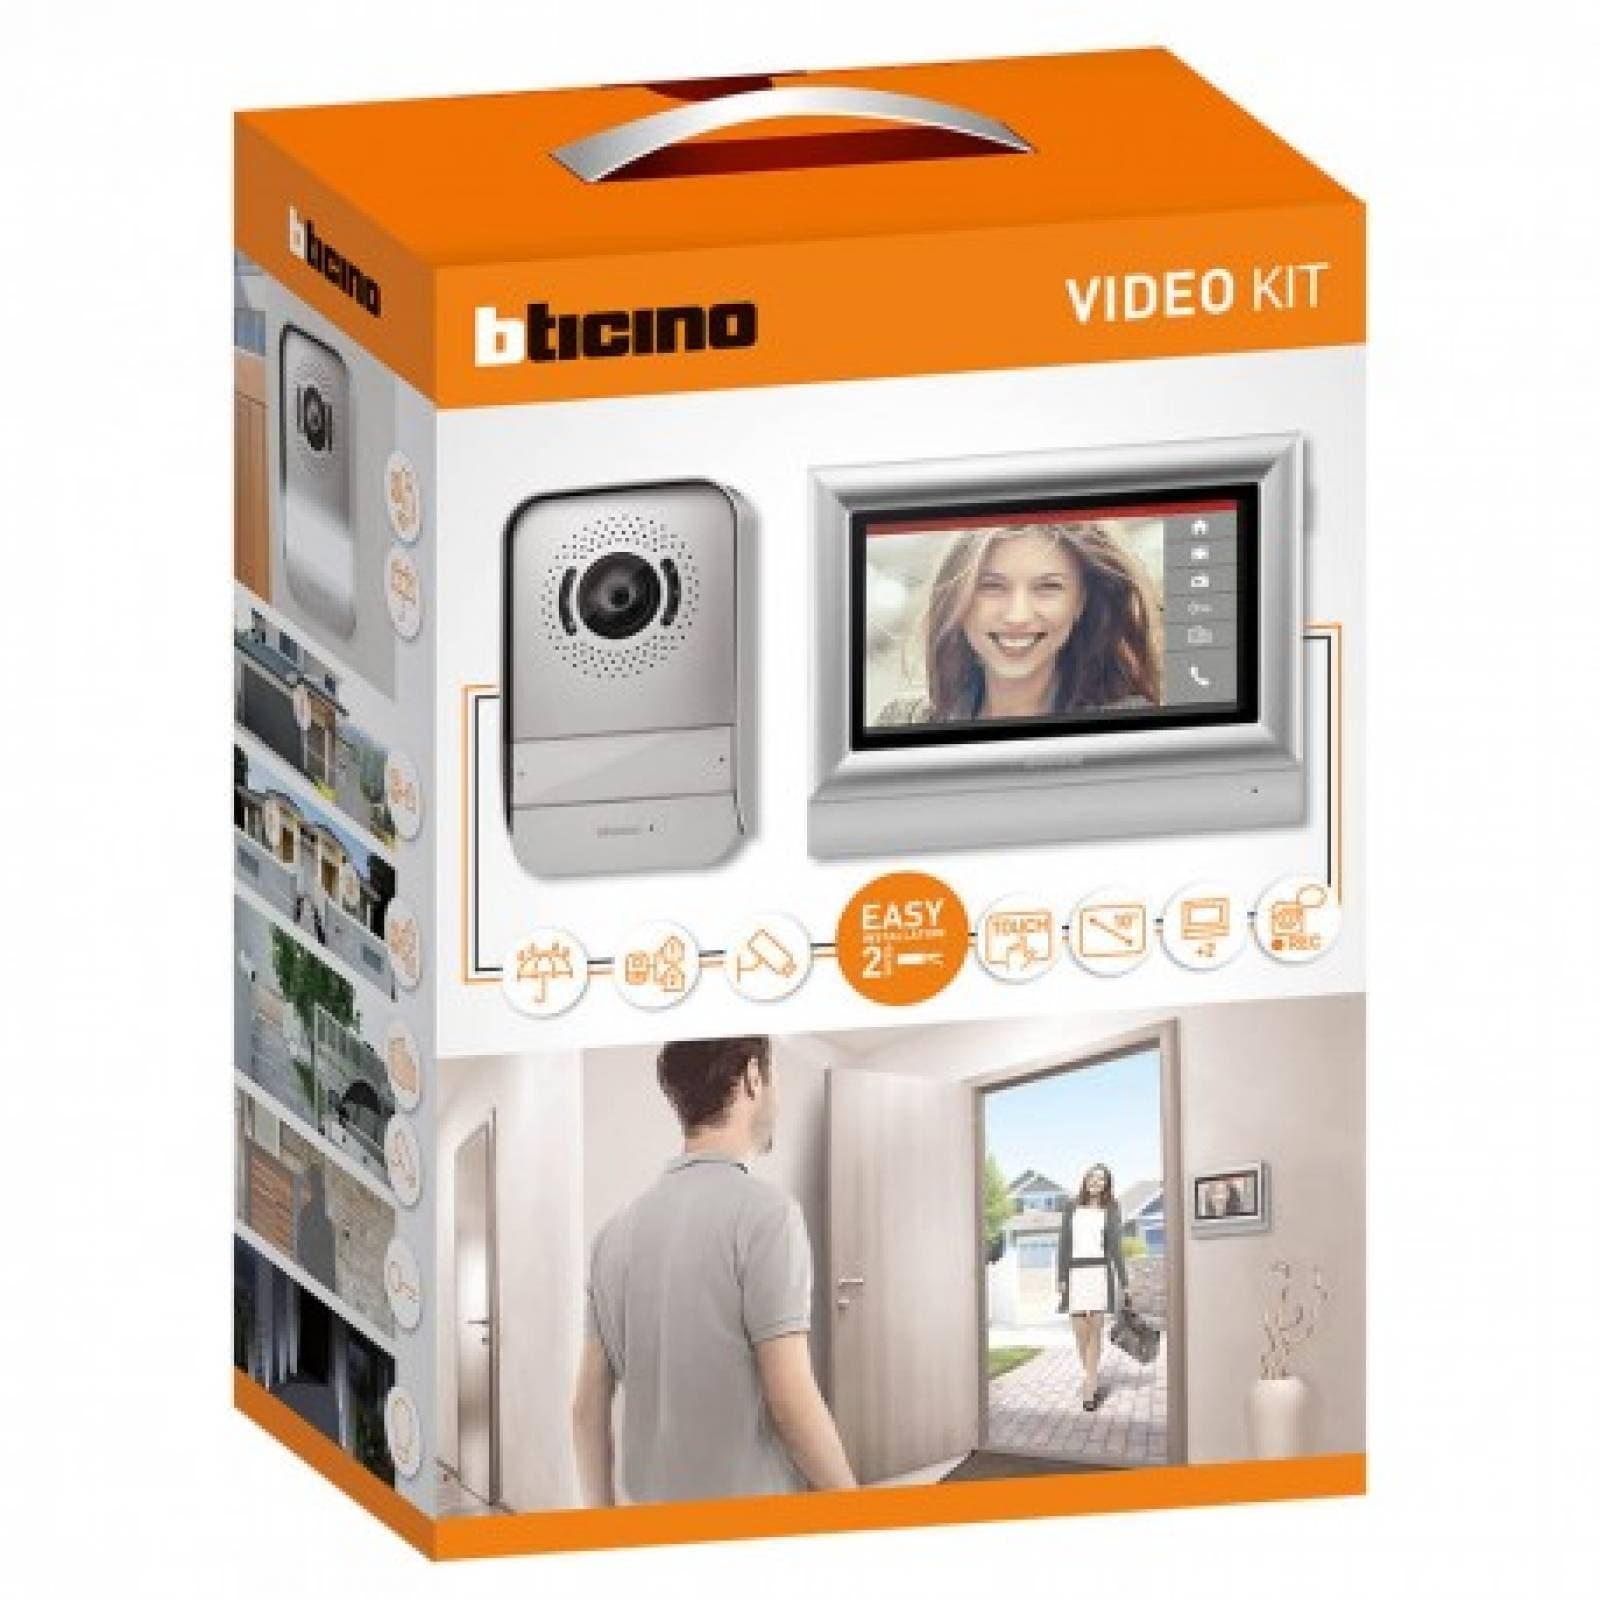 Kit Video Porter Pantalla Táctil 317211 Bticino